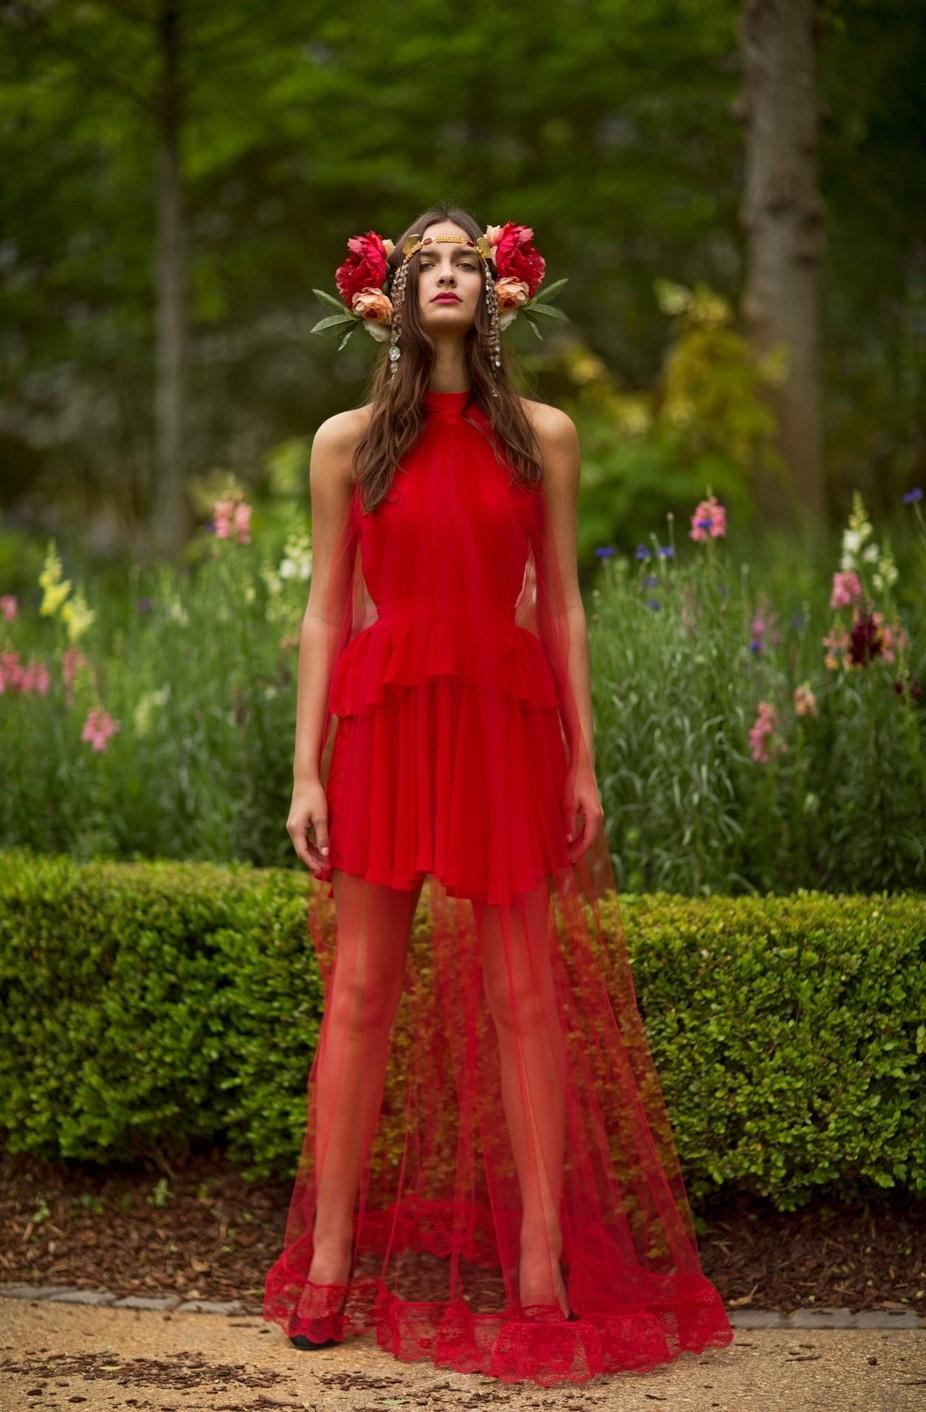 Caroline by tristanduplichain - Celebrating Fashion Photo Contest